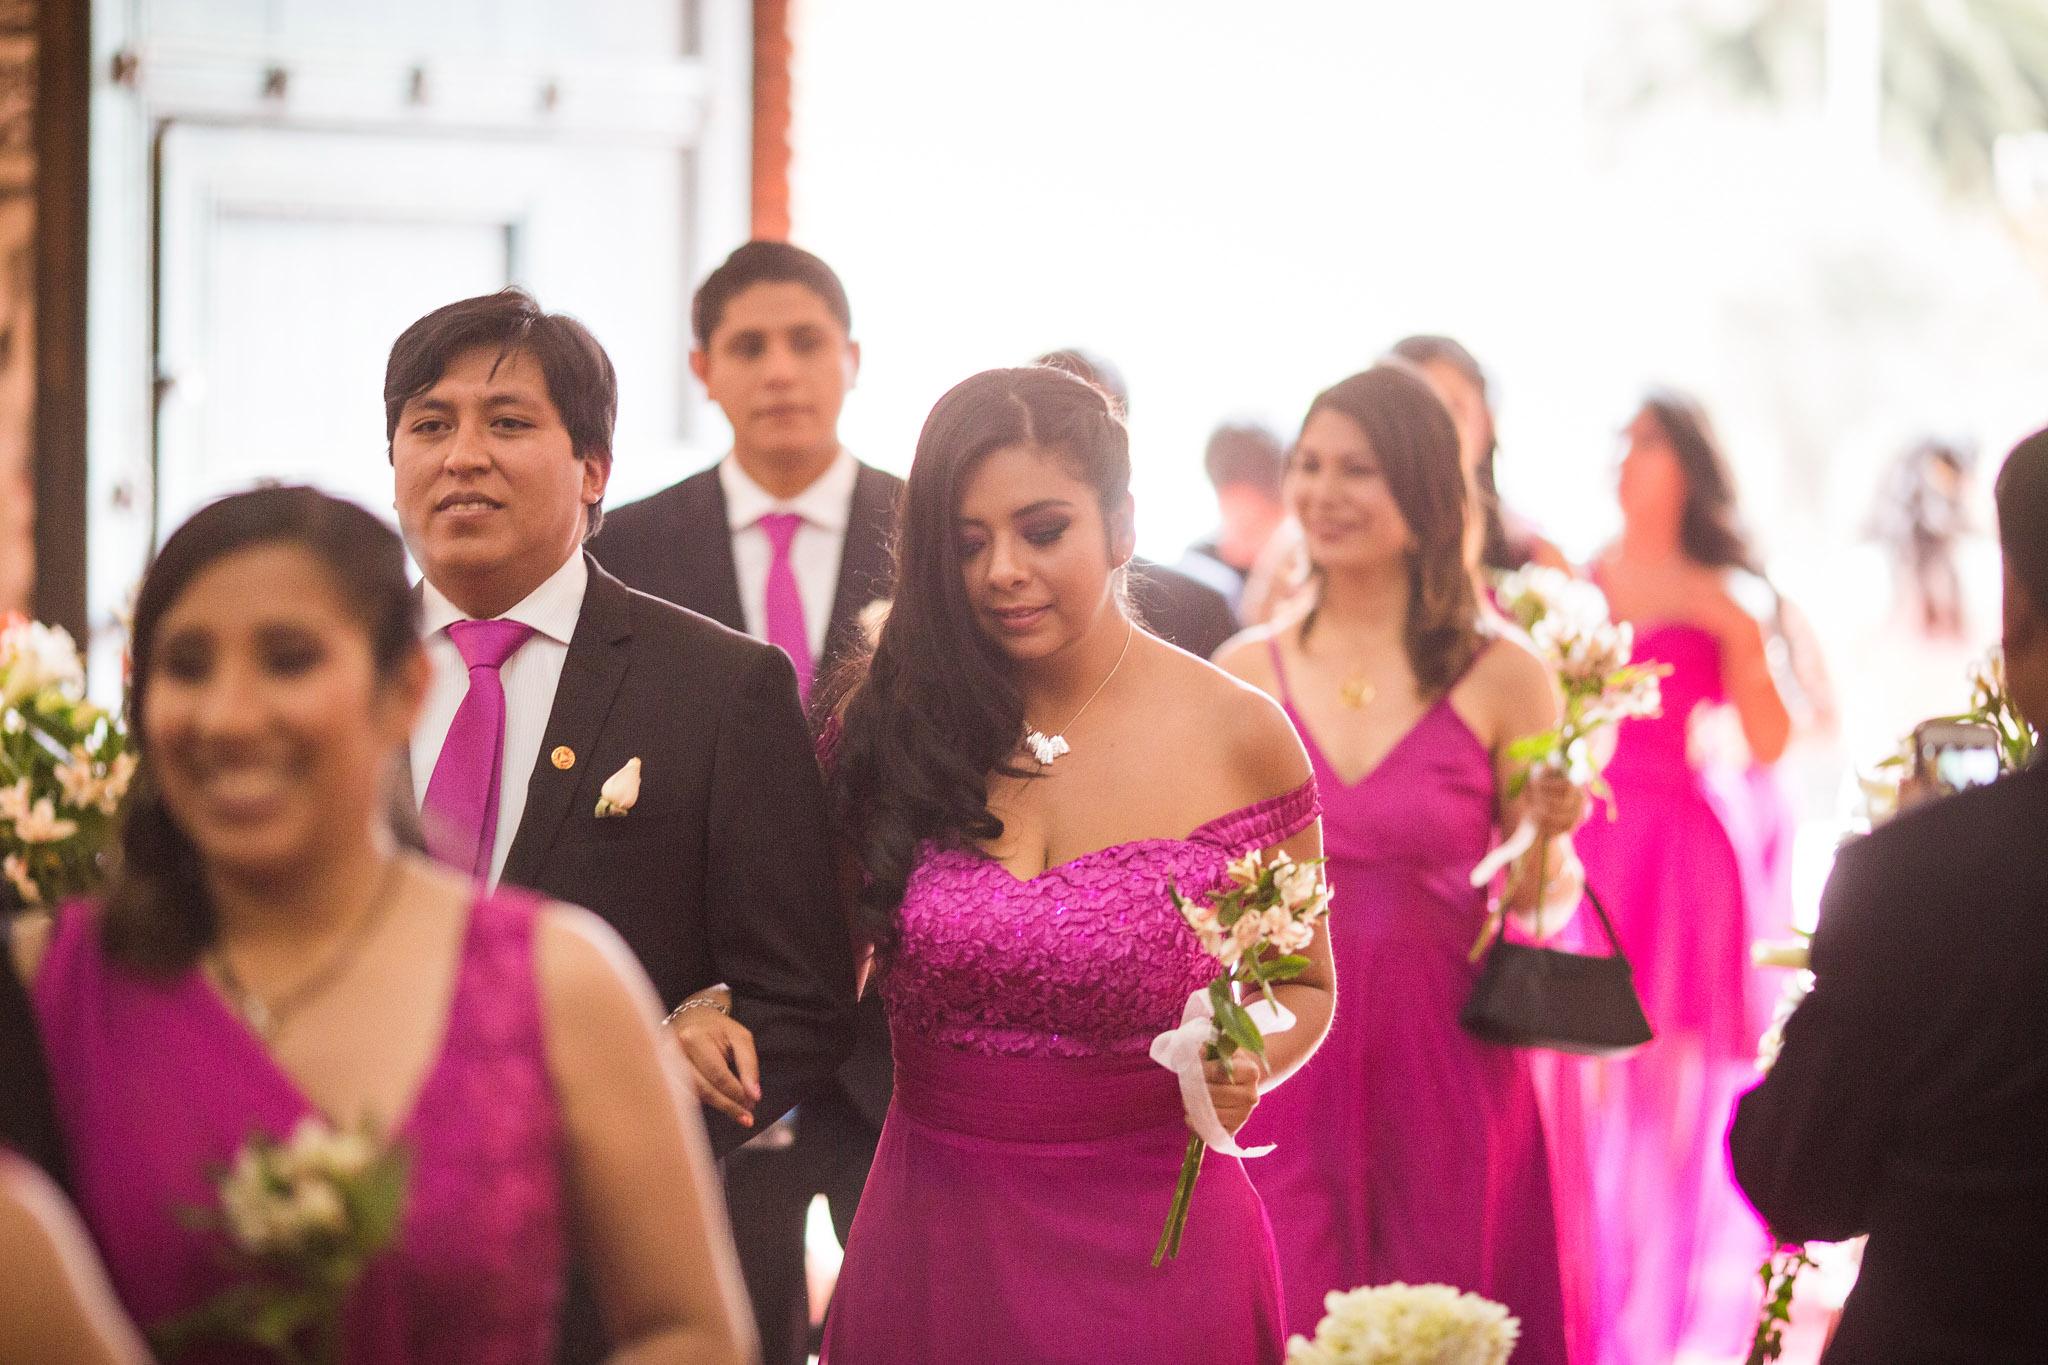 Wedding-Travellers-Destination-Wedding-Peru-Cusco-Hacienda-Sarapampa-Sacred-Valley